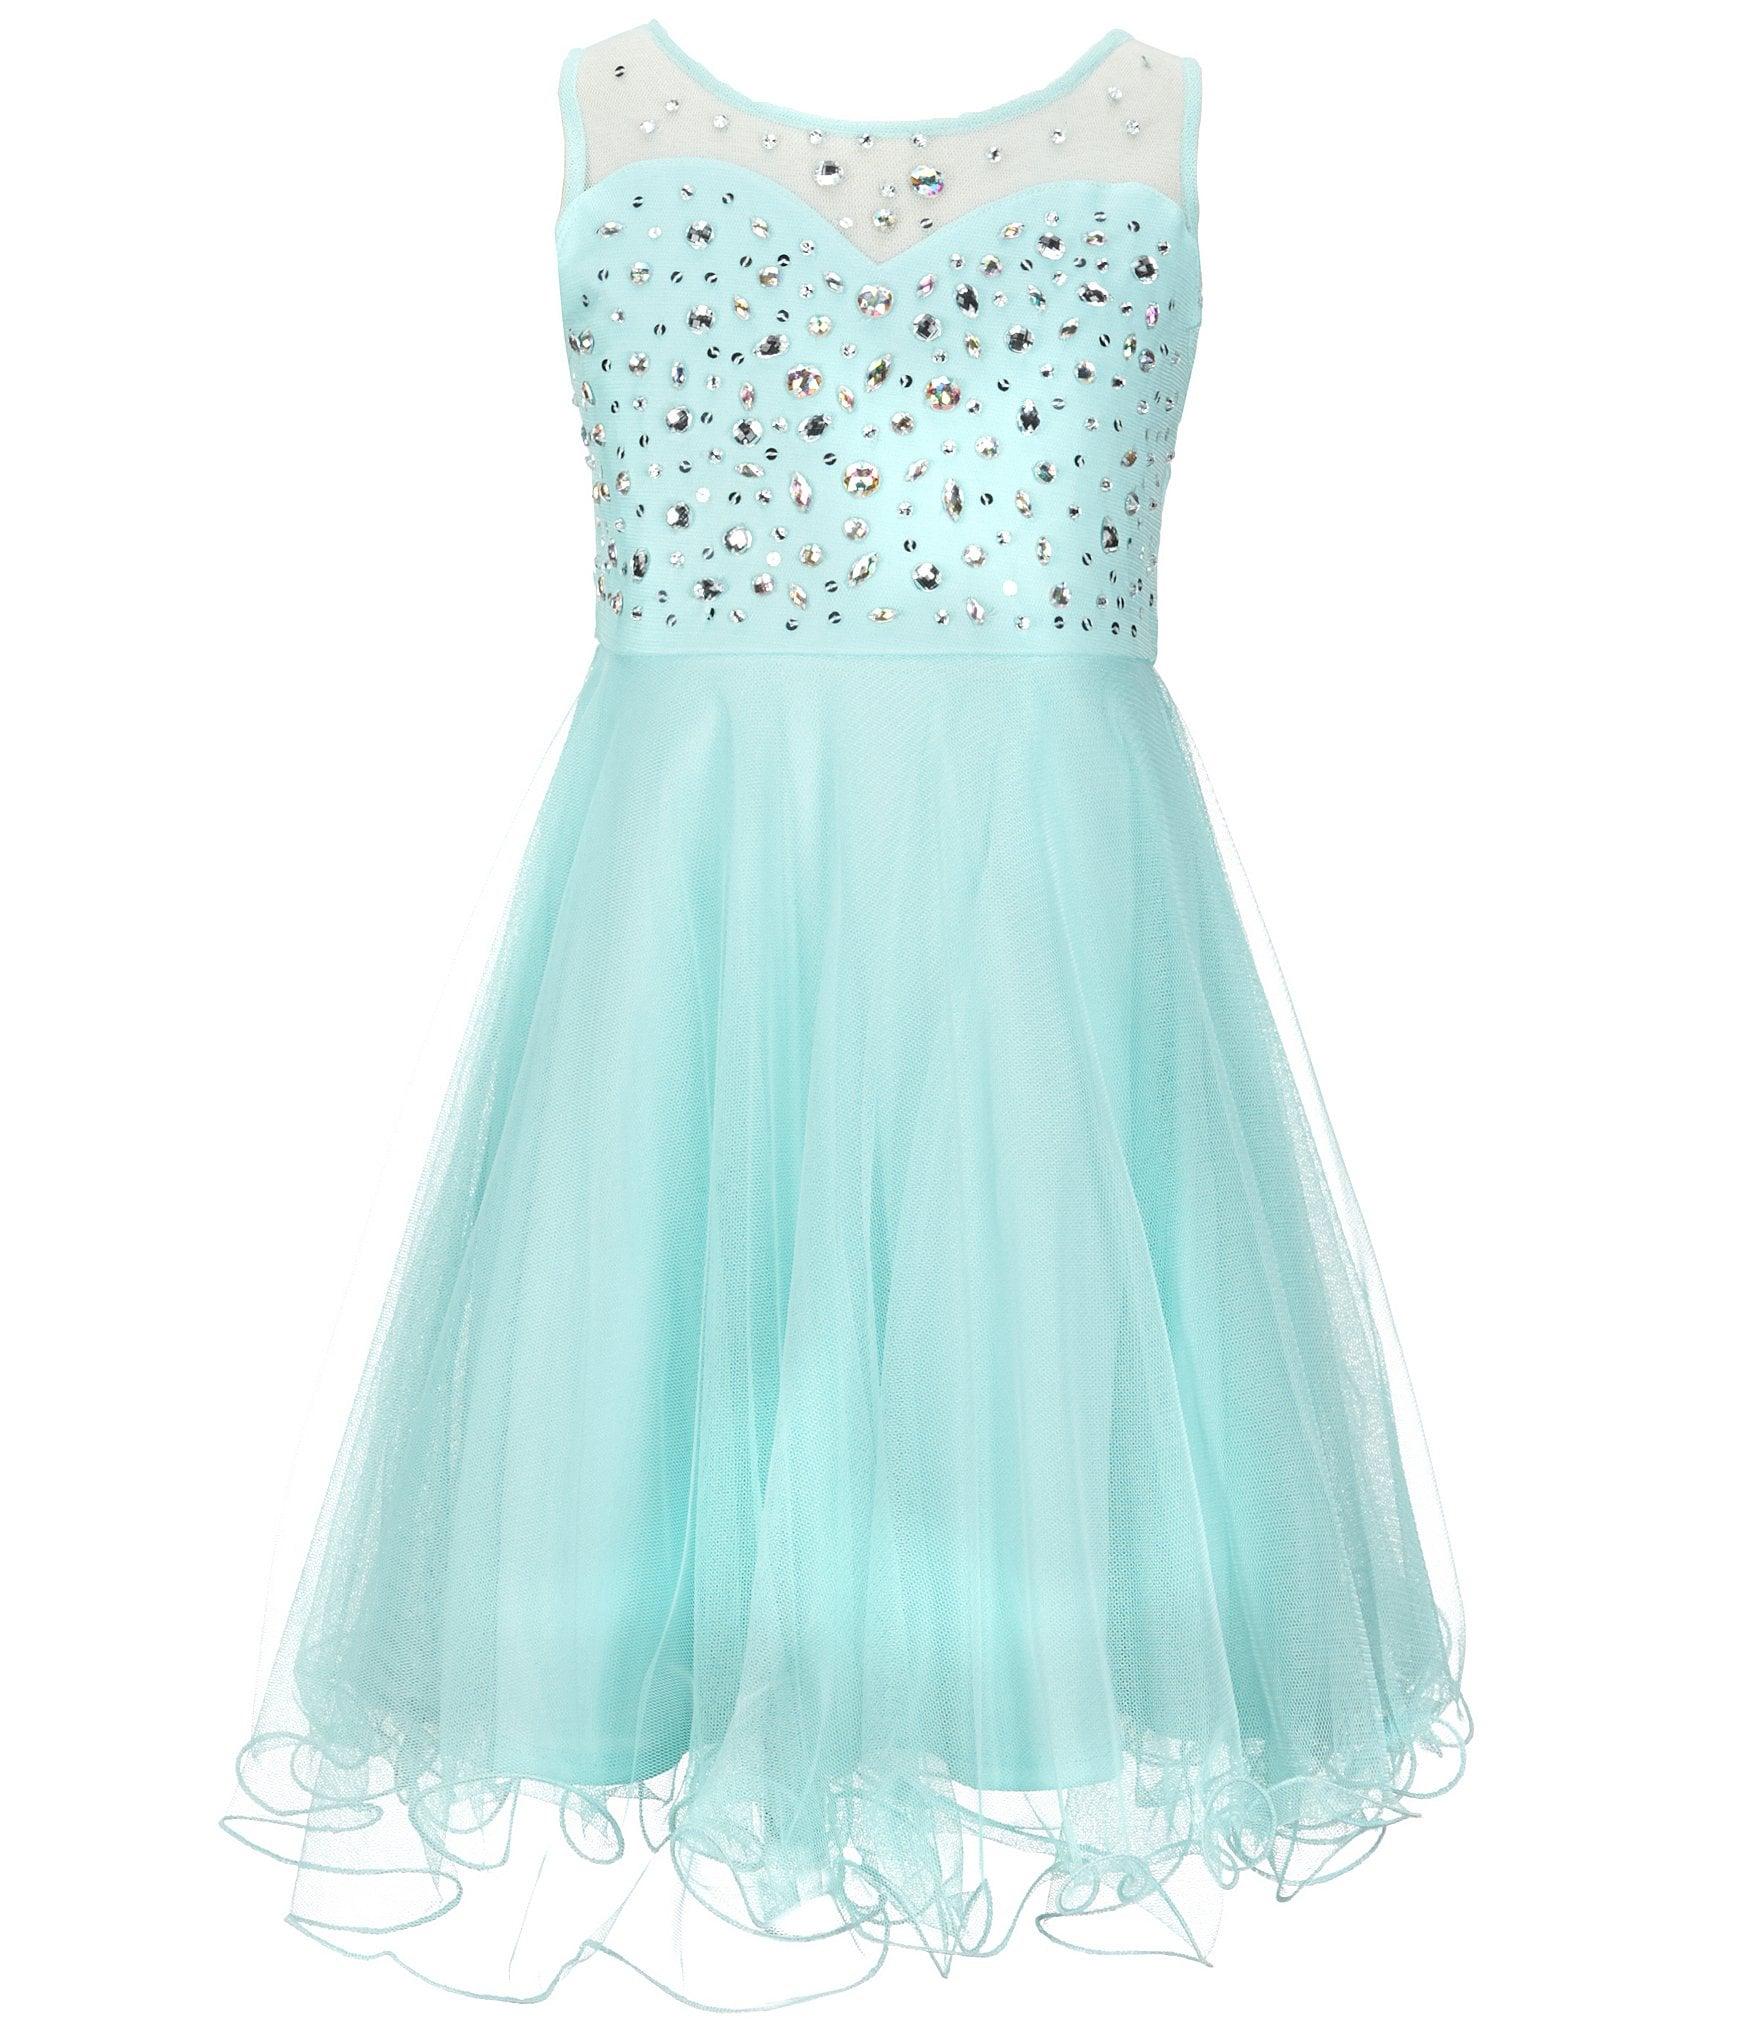 Tween diva big girls 7 16 beaded mesh dress dillards - Diva noche reviews ...